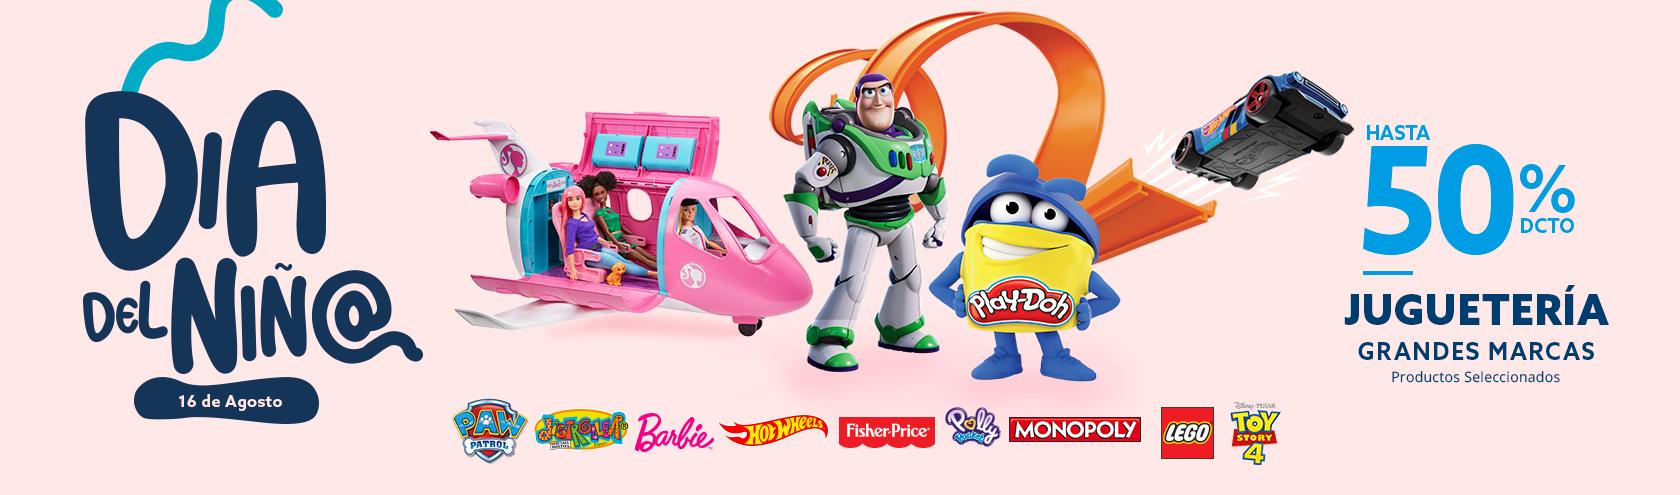 Hasta 50 porciento de descuento Paw Patrol, Barbie, Fisher Price, Hot Wheels, Nerf, Play Doh, Toy Story, Lego, LOL